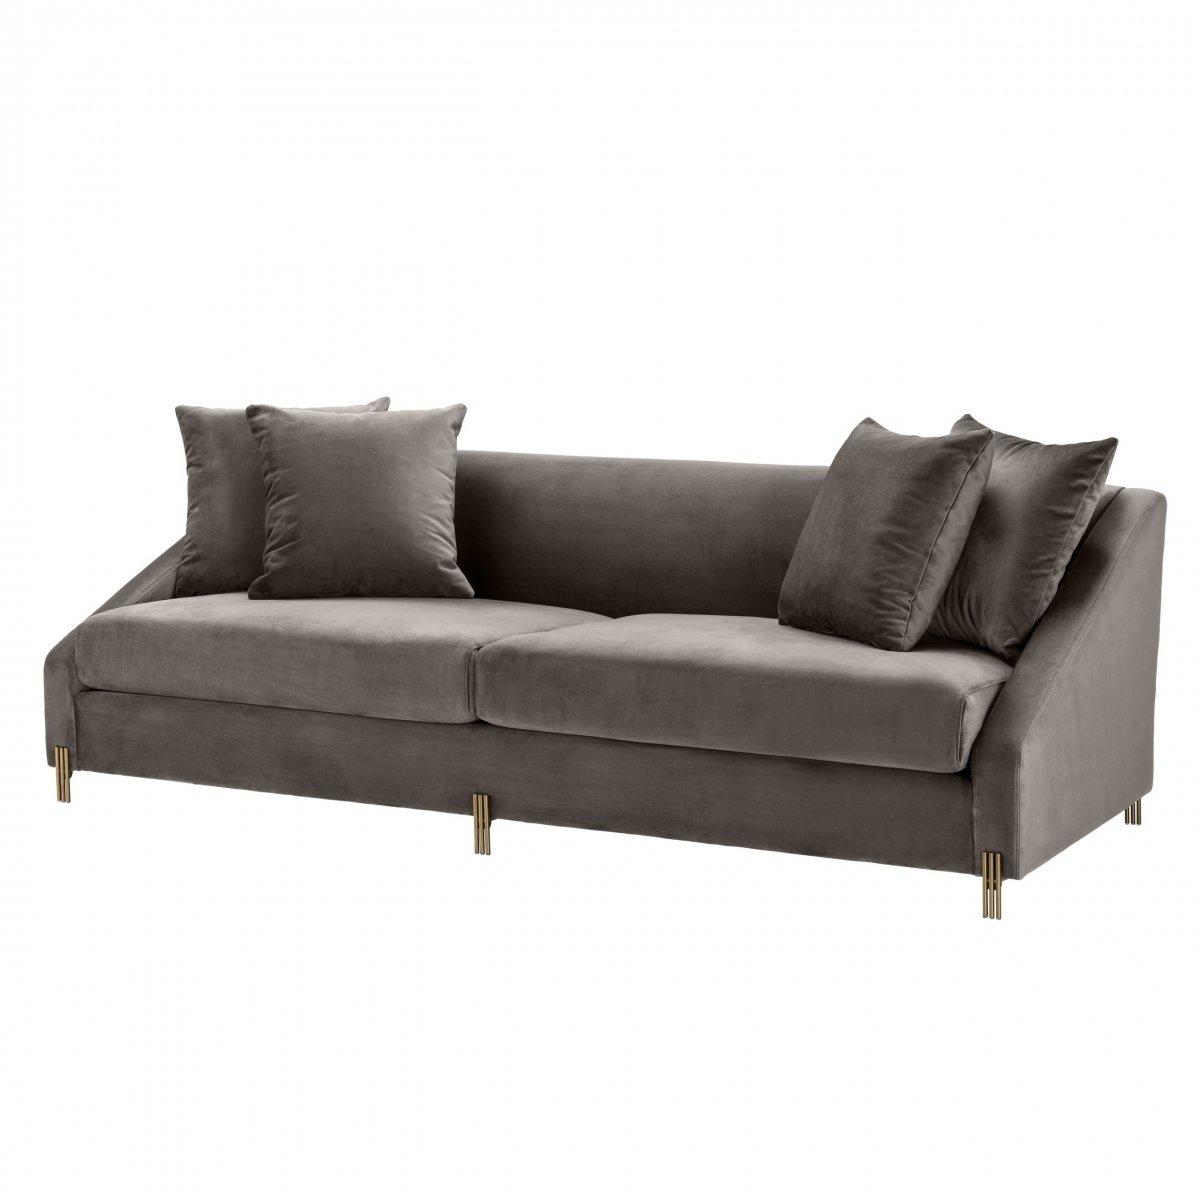 Диван Eichholtz Sofa Candice grey  - фото 1